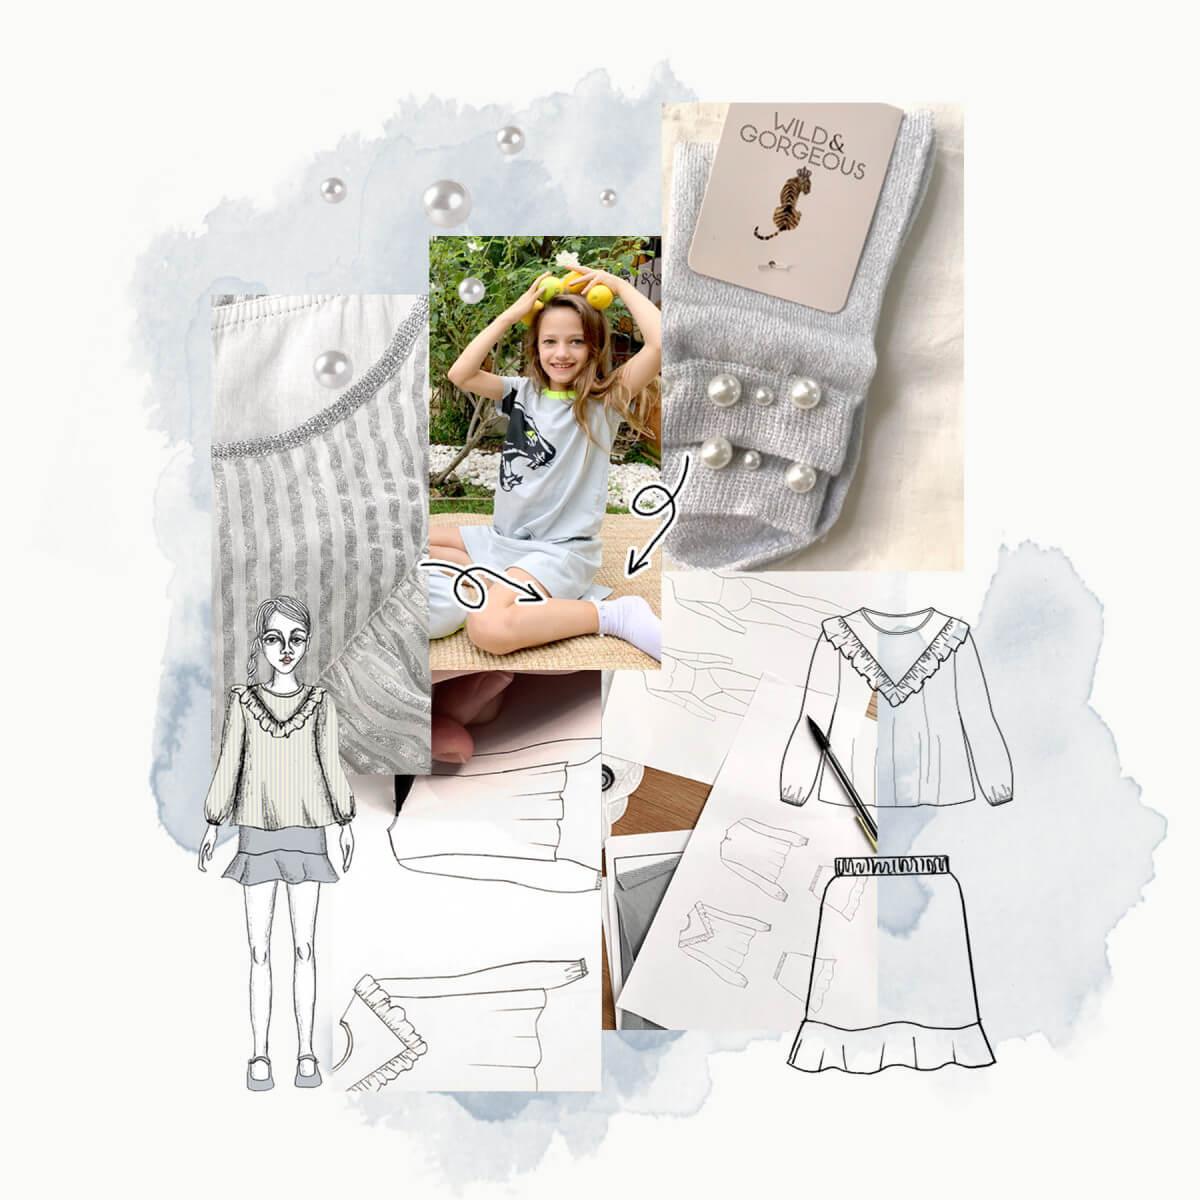 Studio Wild & Gorgeous - Fashion Design Class #3 - Technical Illustrations Part 2